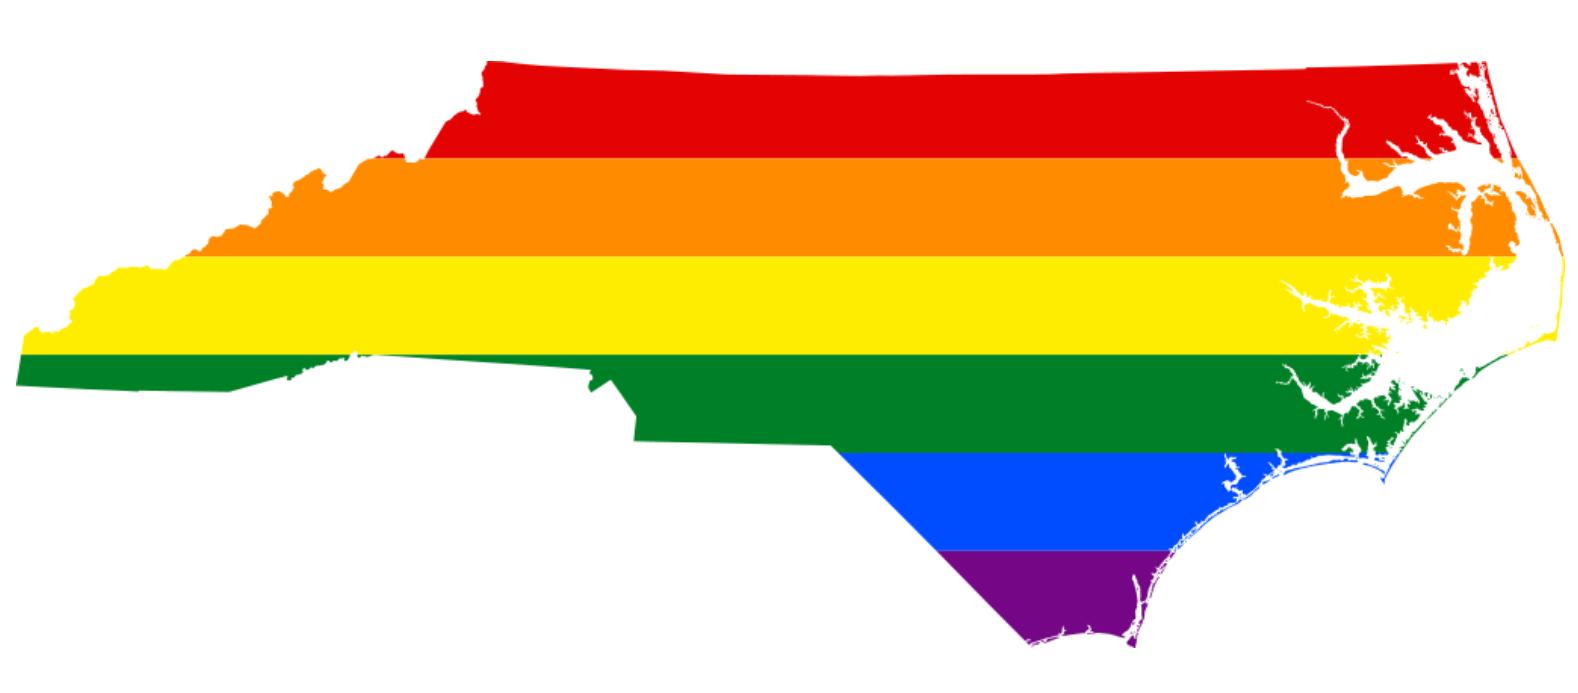 North Carolina in LGBT rainbow colors